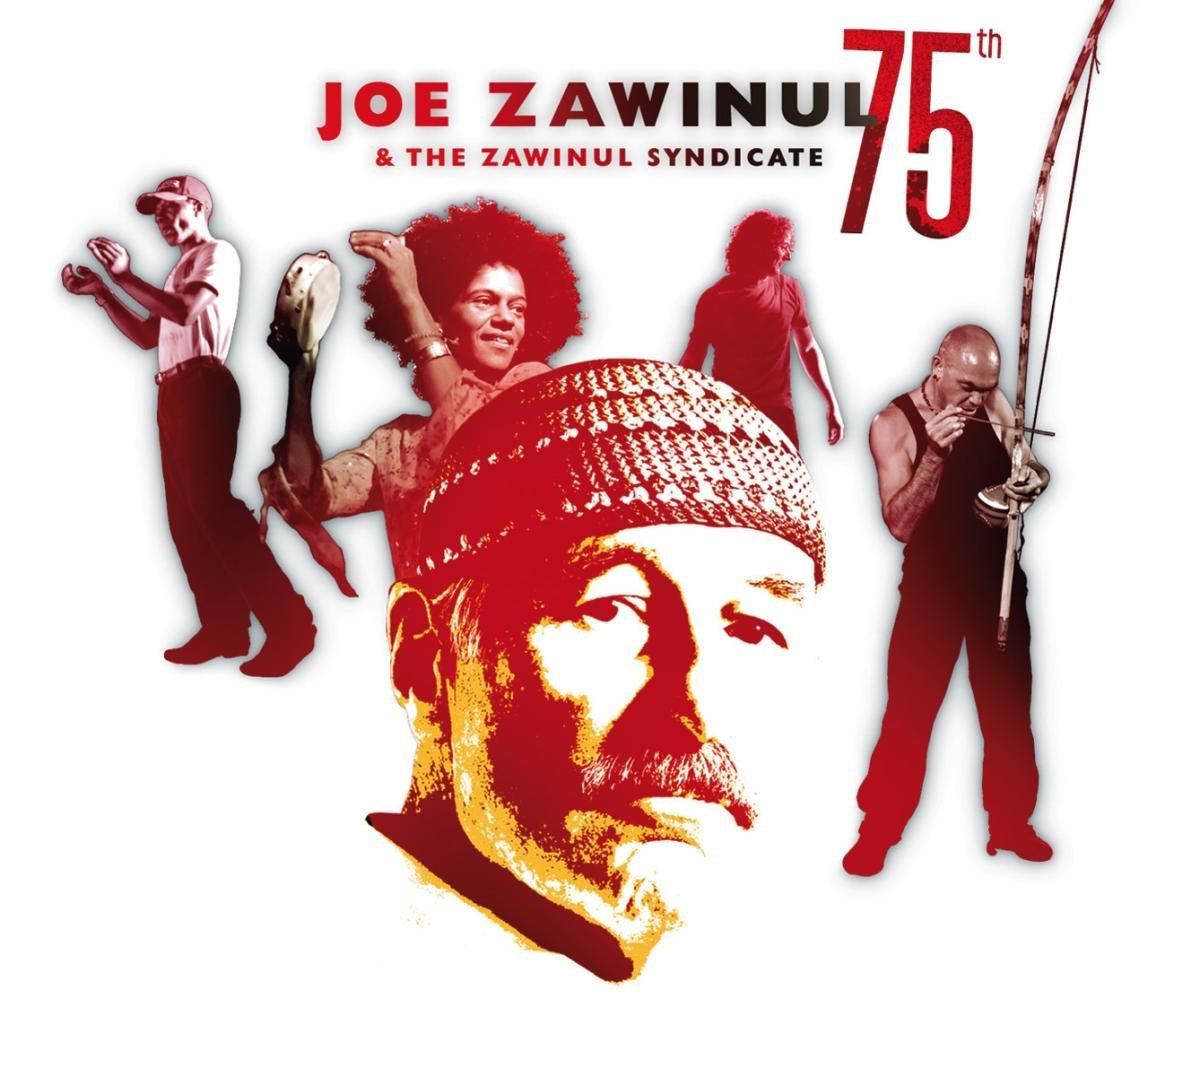 Джо Завинул,The Zawinul Syndicate Joe Zawinul & The Zawinul Syndicate. 75th (2 LP) джо хендерсон joe henderson mode for joe lp